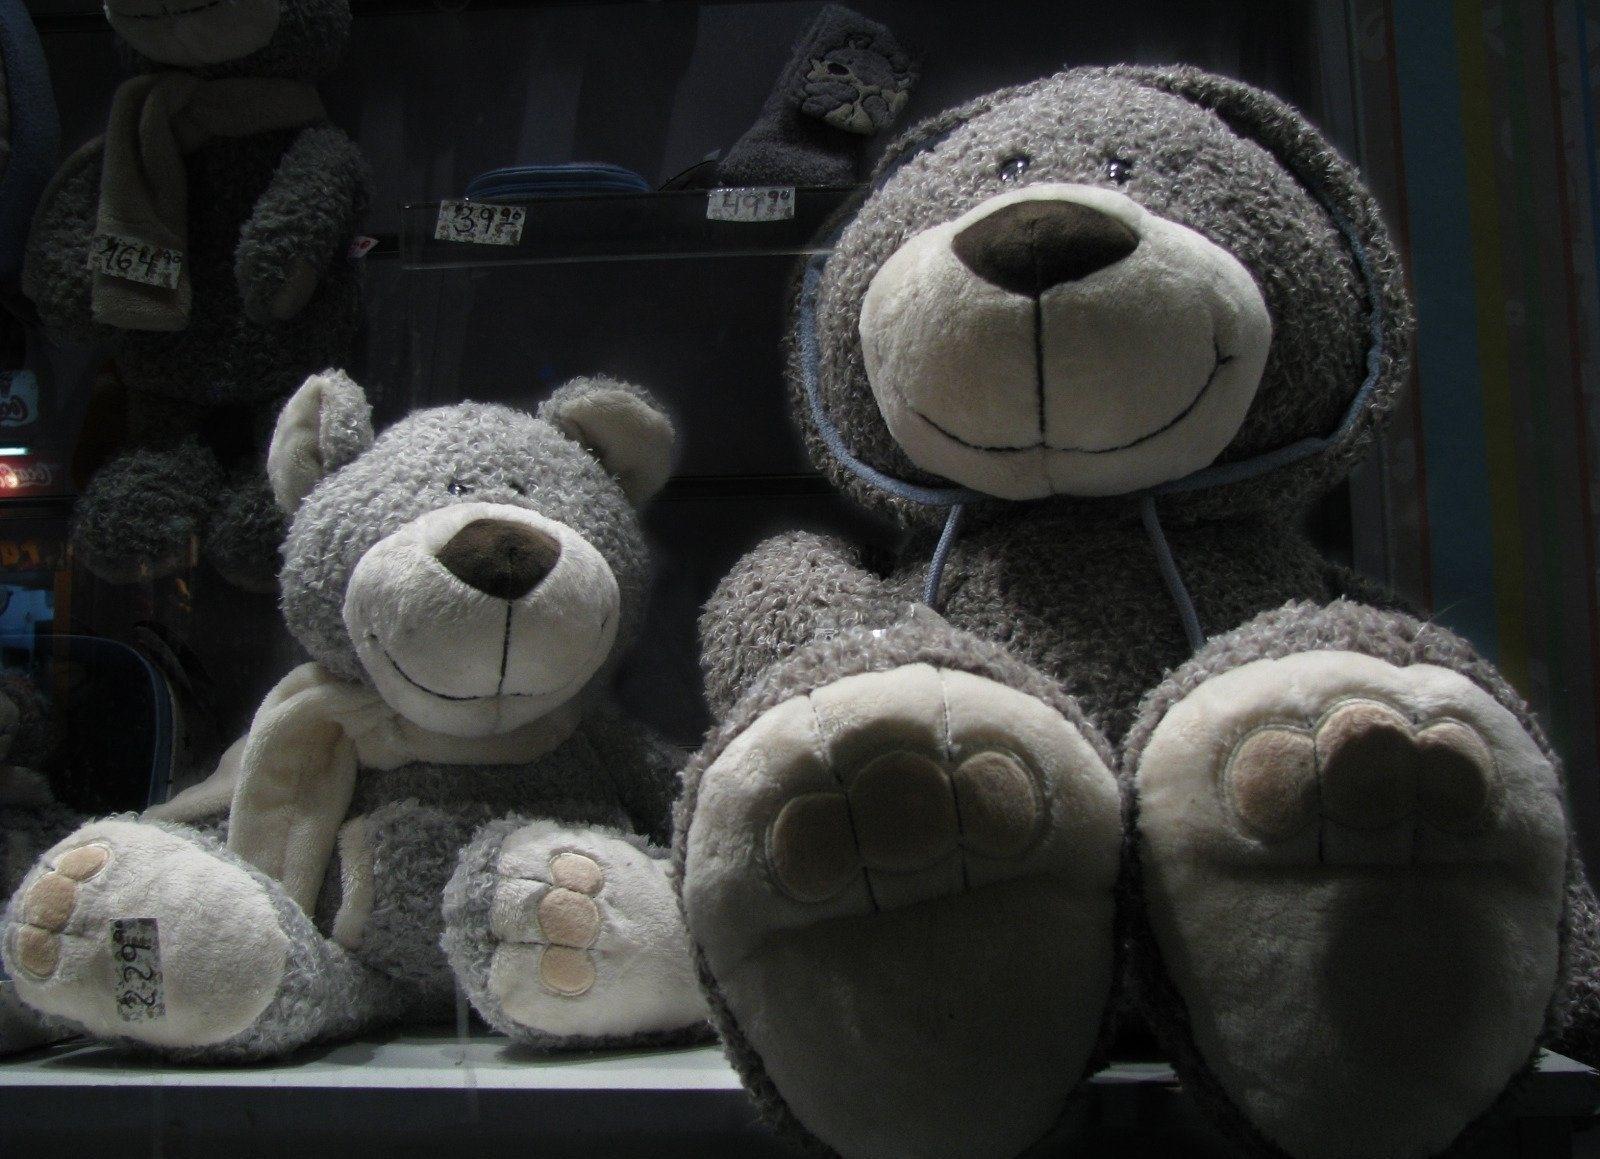 153005 Заставки и Обои Медведи на телефон. Скачать Игрушки, Медведи, Разное, Множество, Полка, Магазин картинки бесплатно